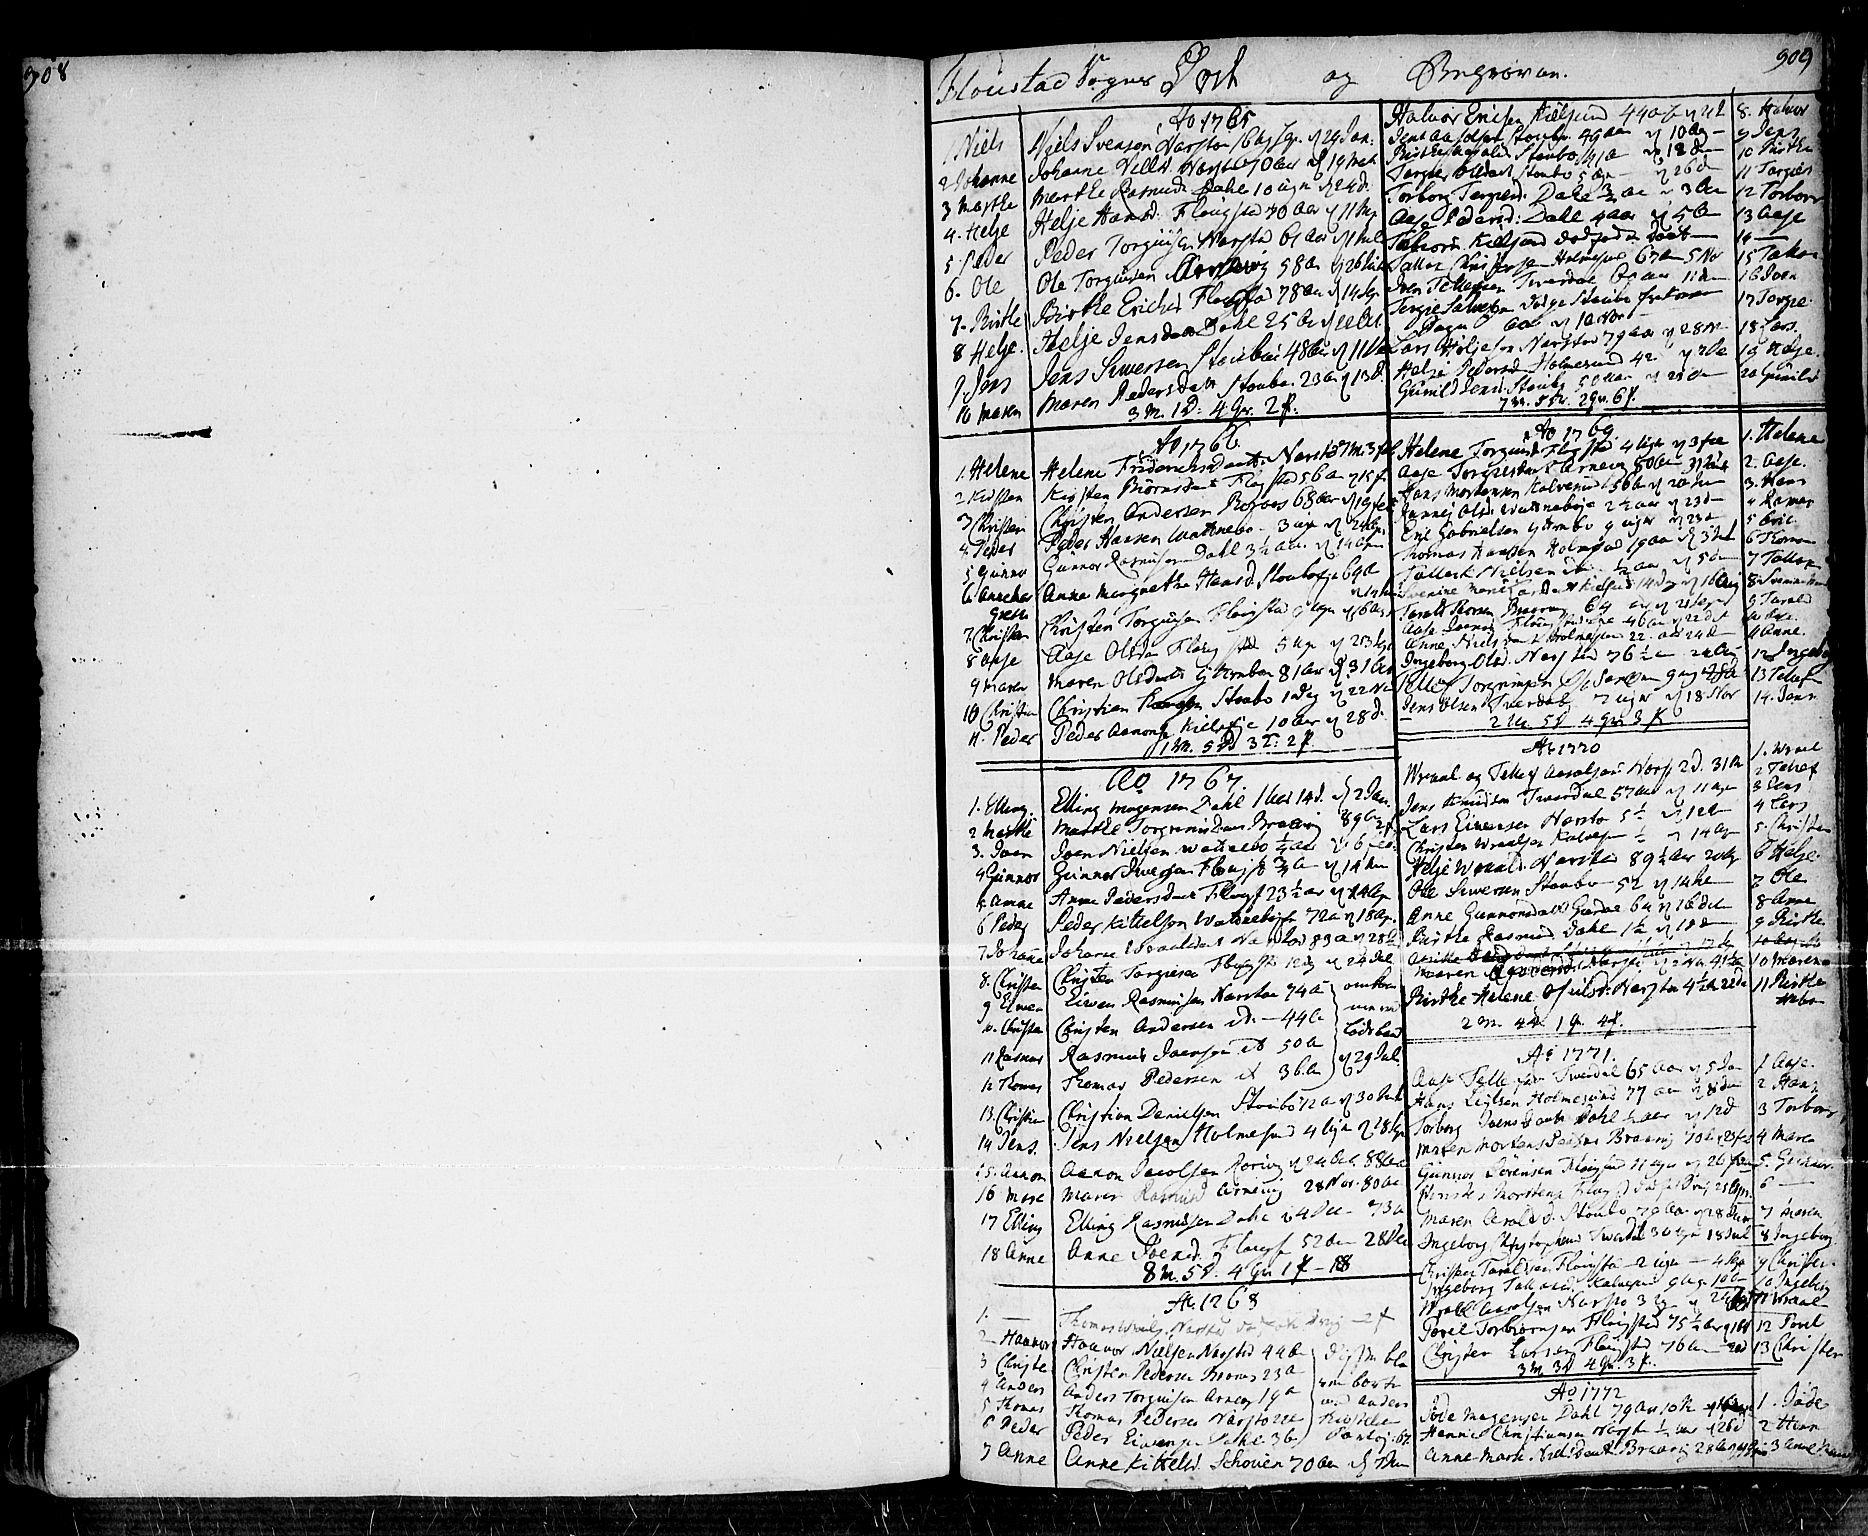 SAK, Dypvåg sokneprestkontor, F/Fa/Faa/L0001: Ministerialbok nr. A 1 /2, 1765-1798, s. 908-909